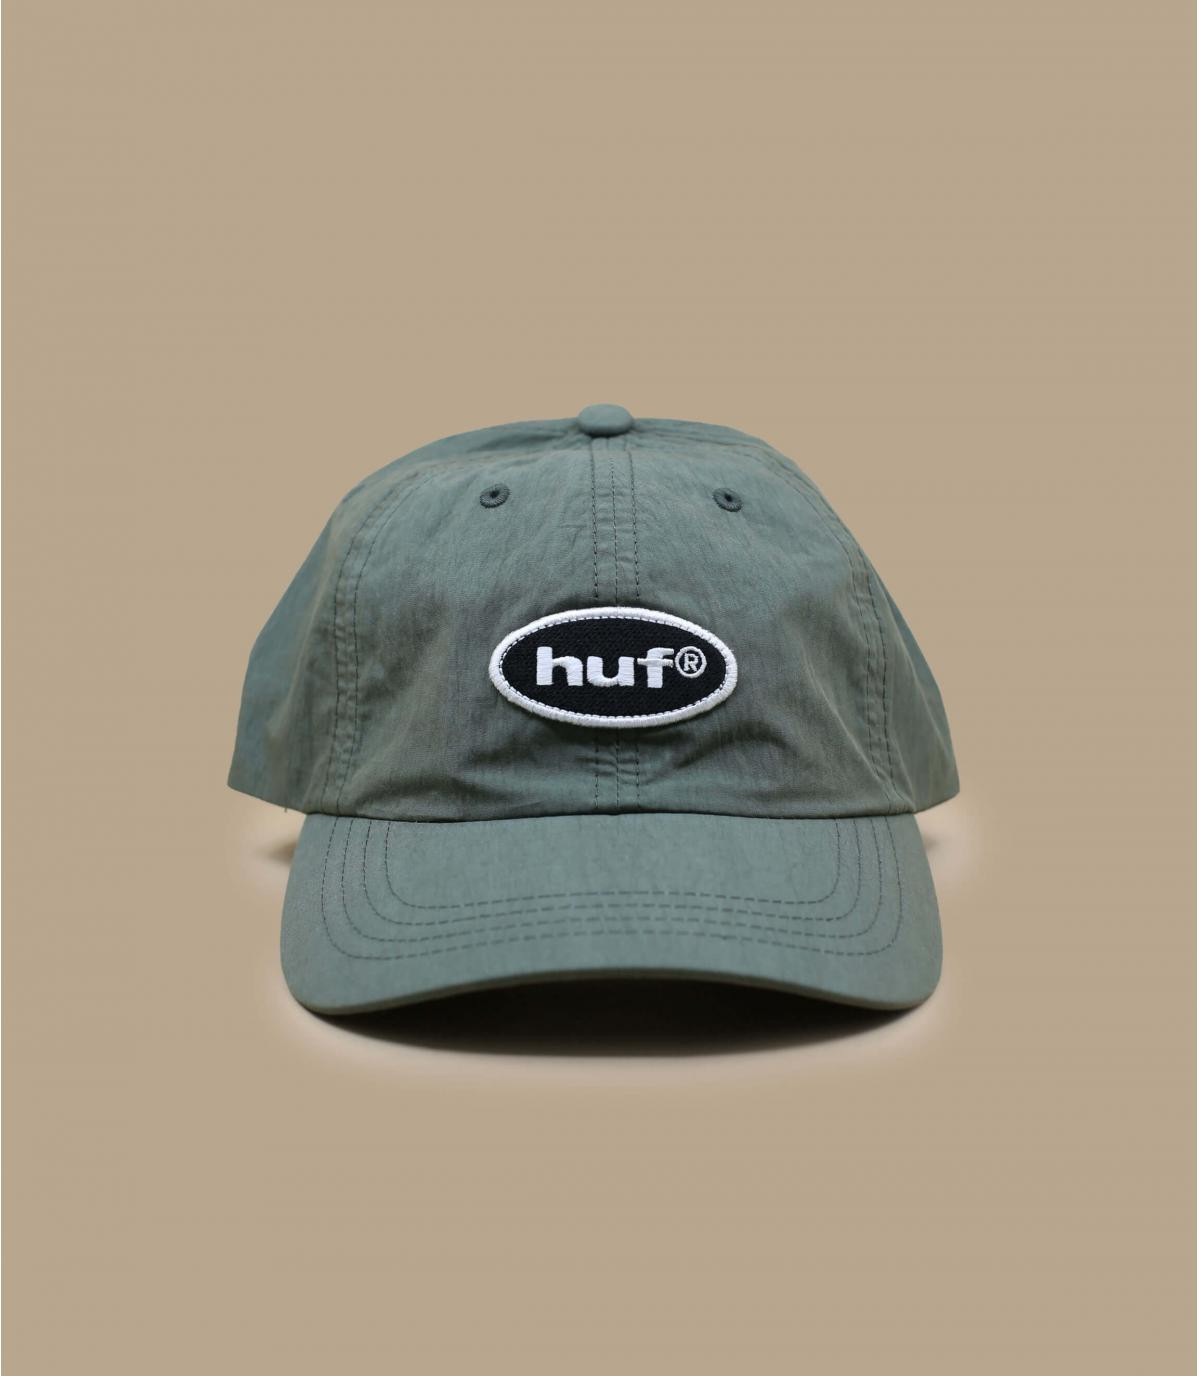 Green Huf cap